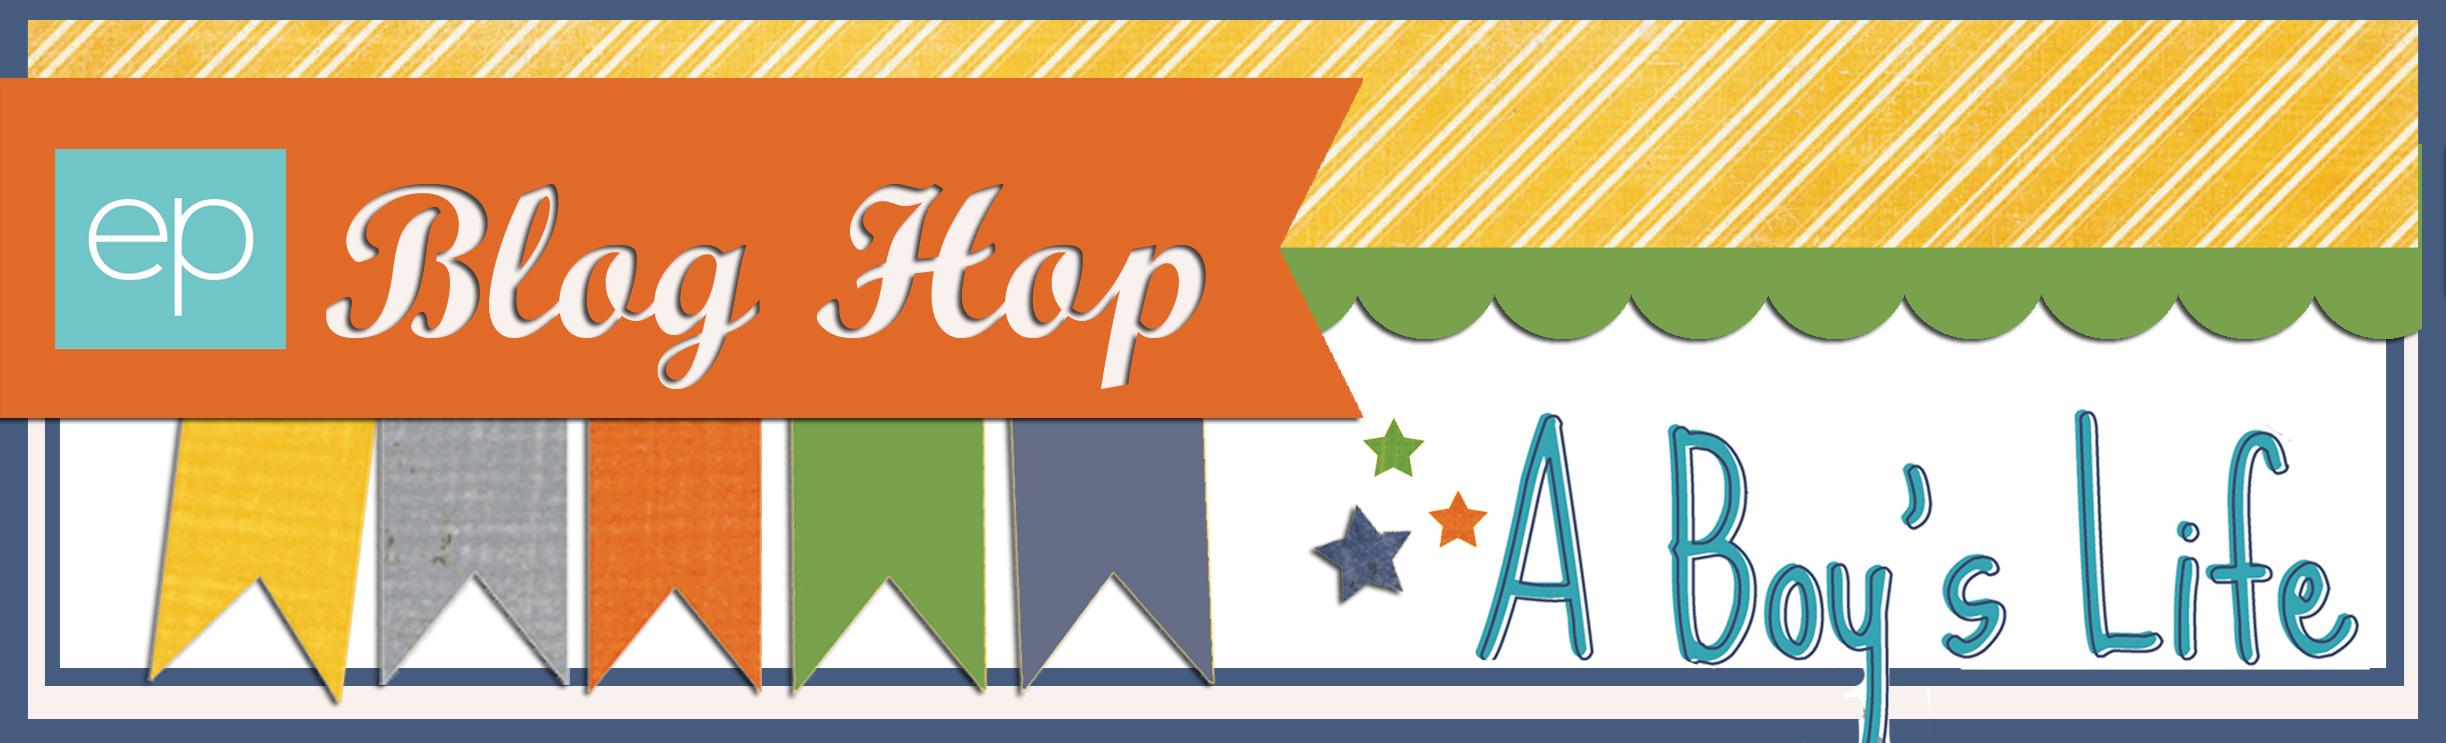 A-Boys-Life-Blog-Hop-Banner